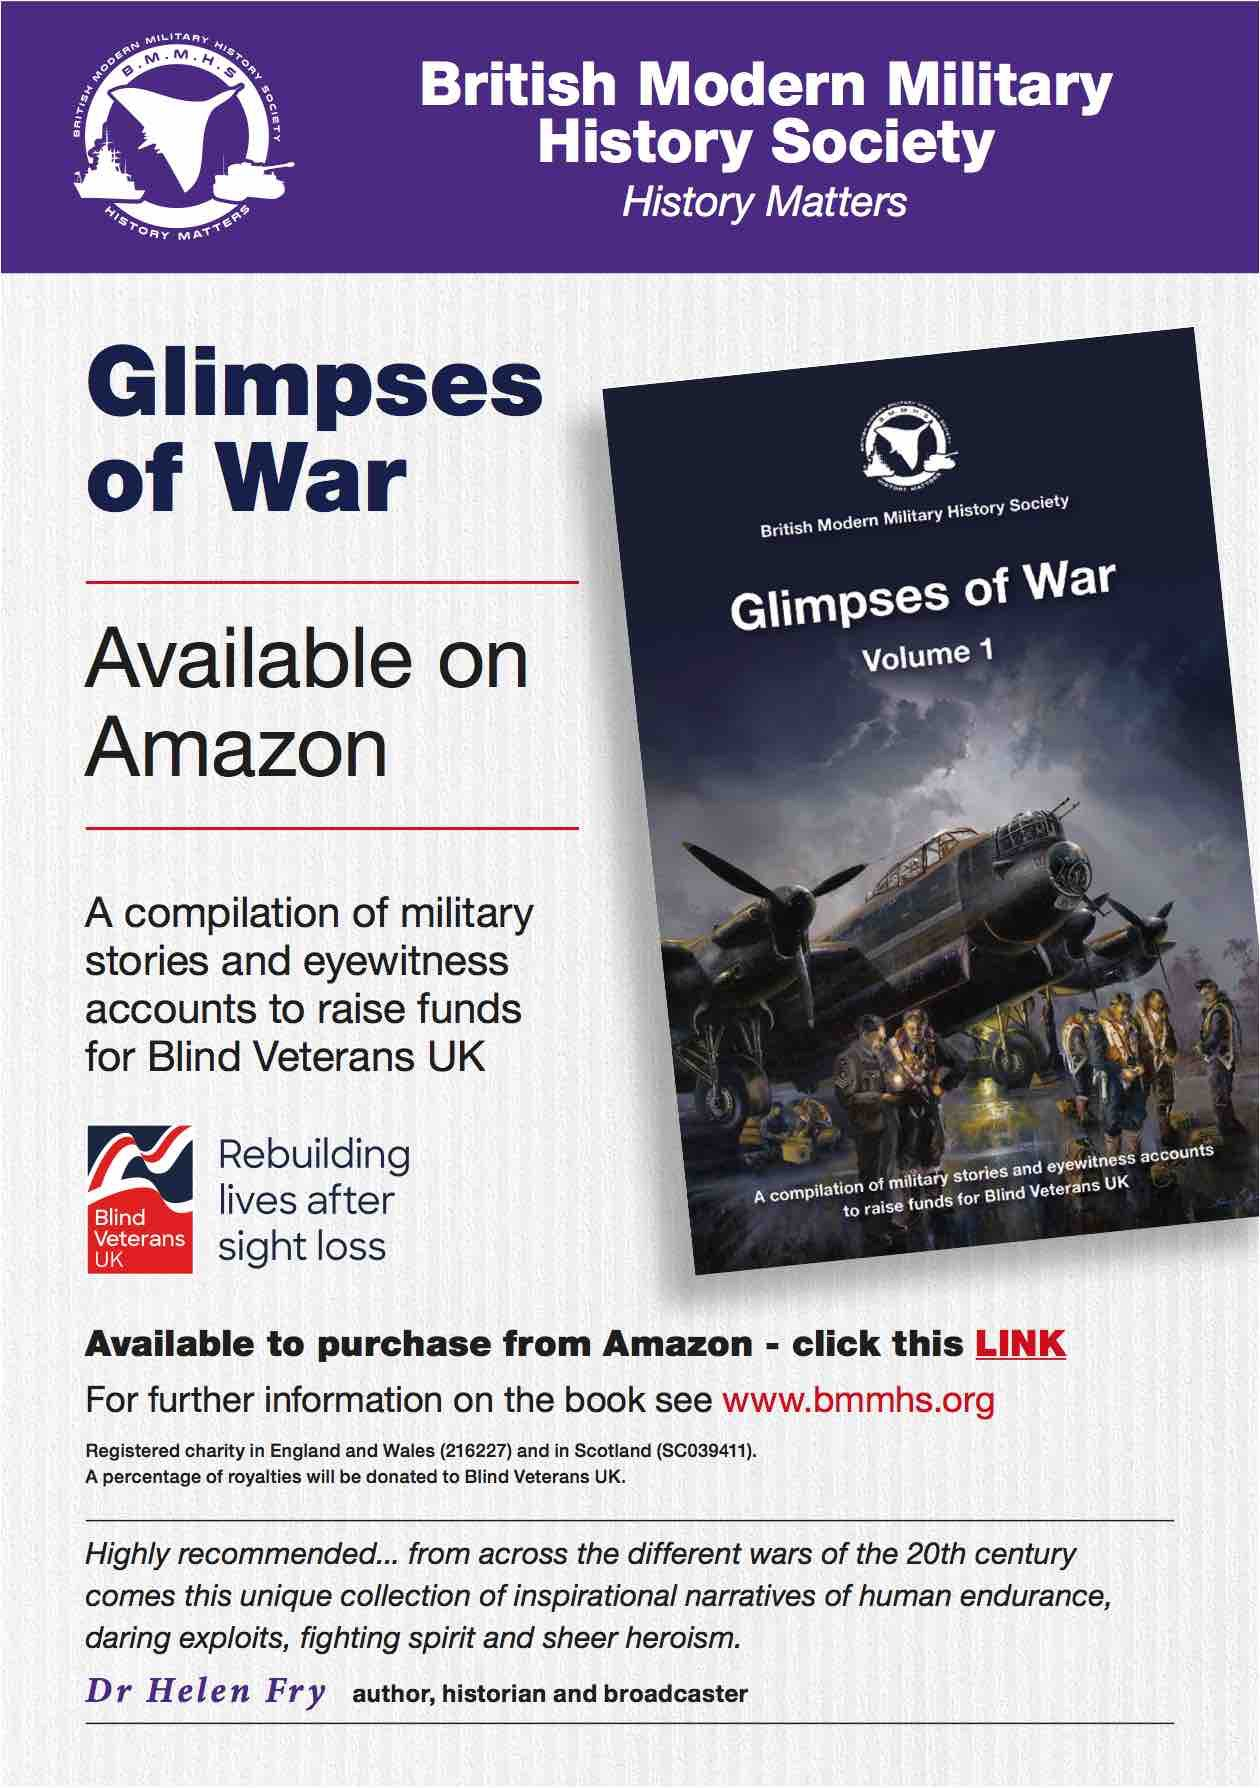 Glimpses of War – Volume 1